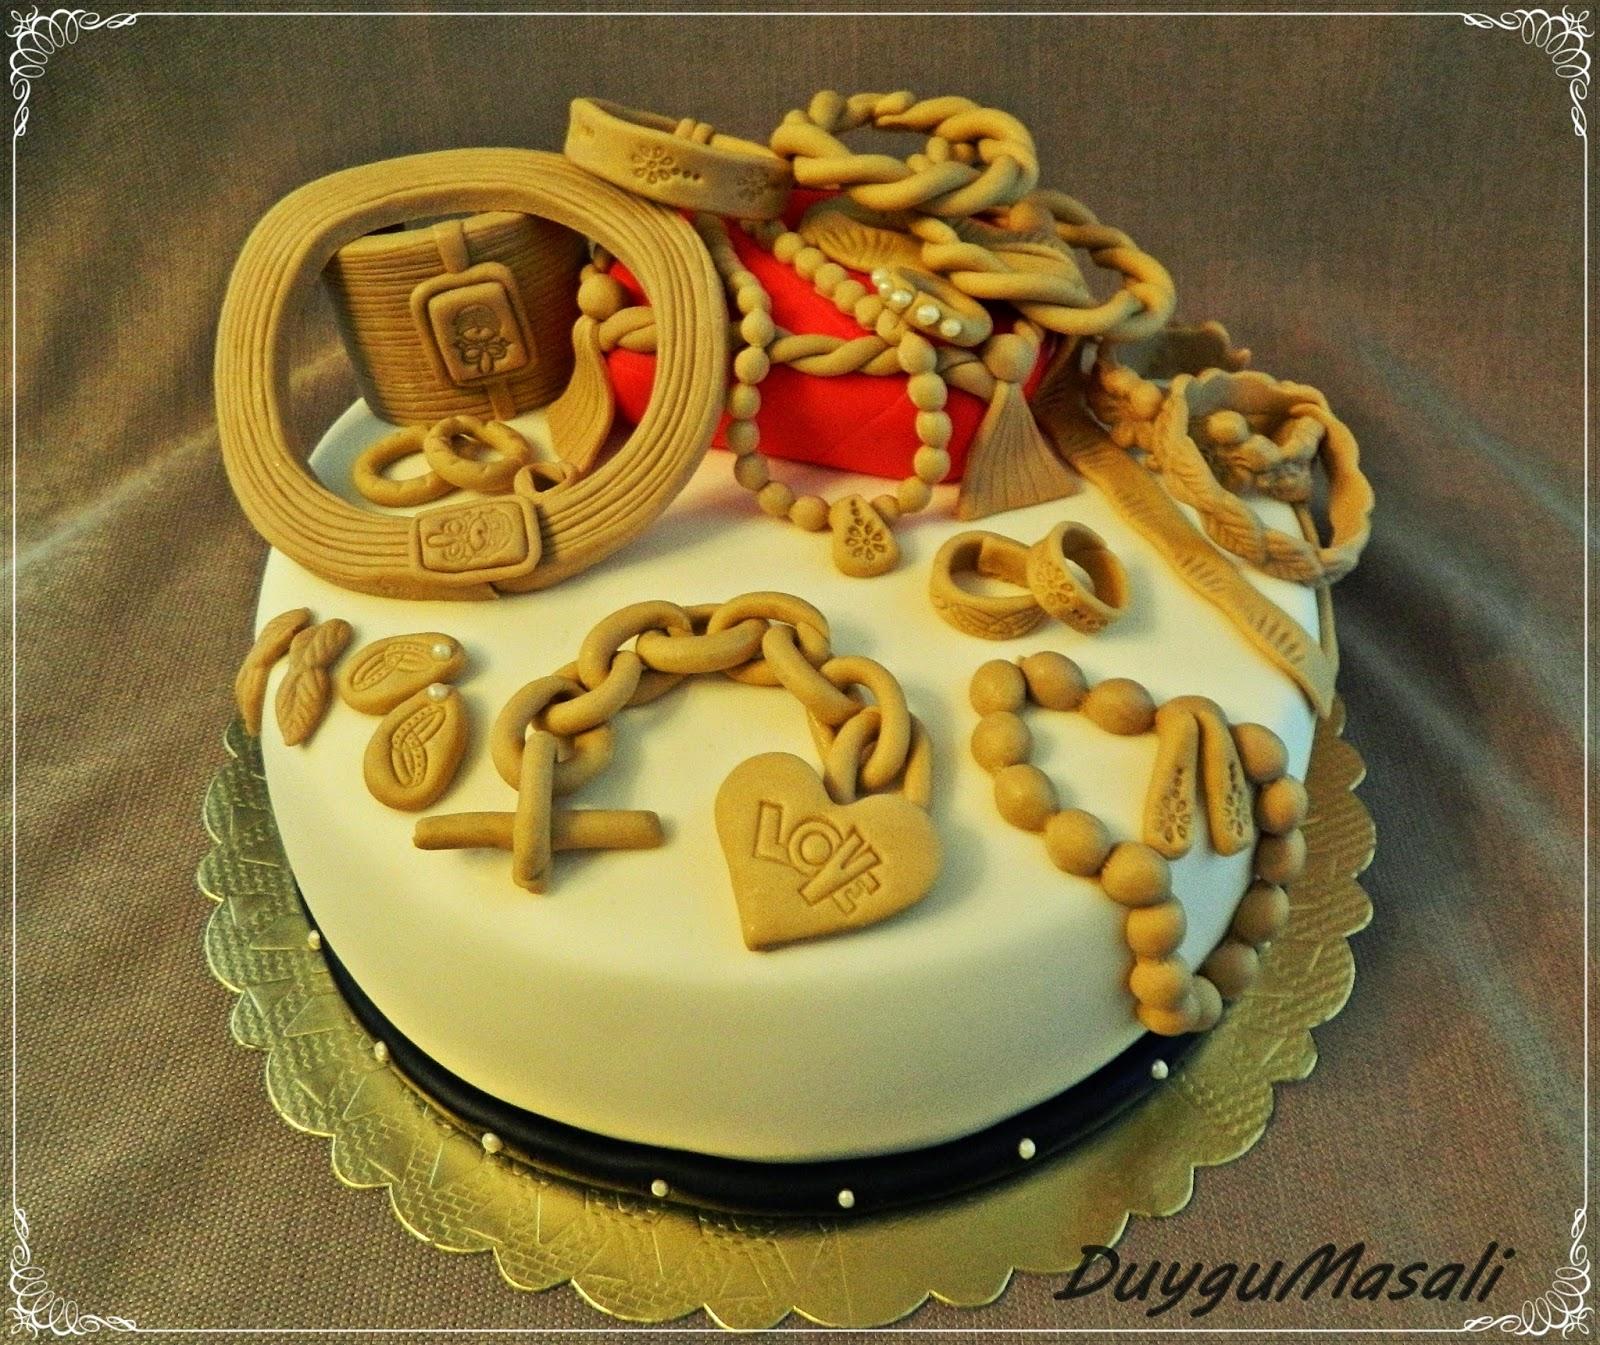 edirne kuyumcu butik pasta